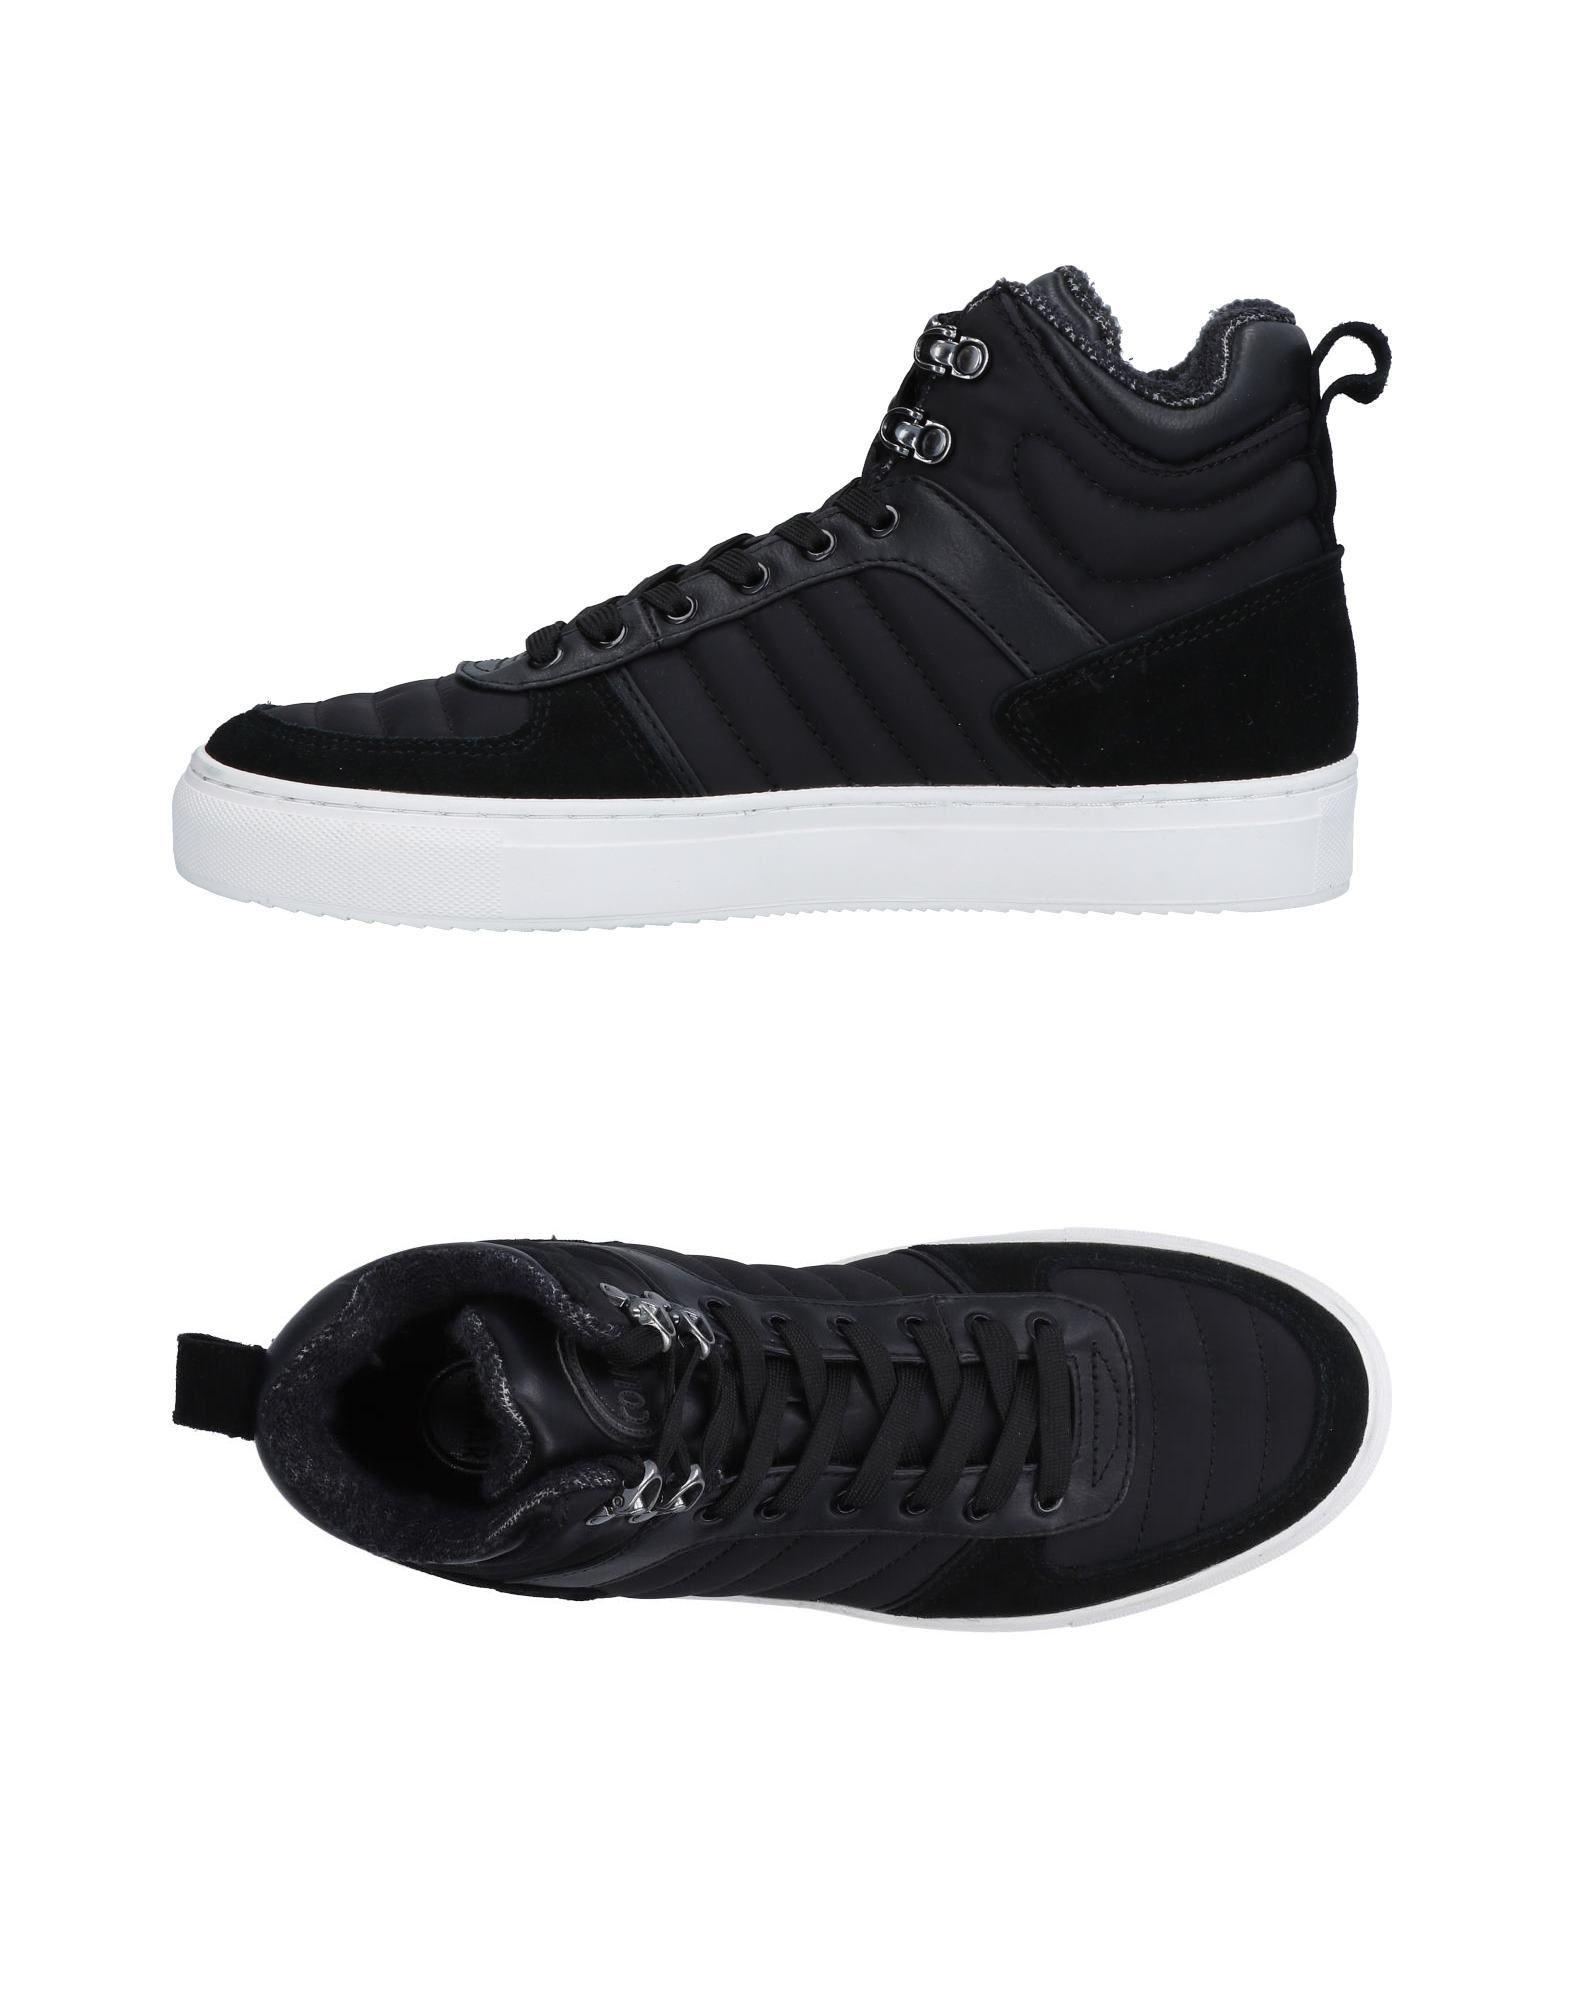 Colmar Sneakers - - - Men Colmar Sneakers online on  United Kingdom - 11283469JC 17b836